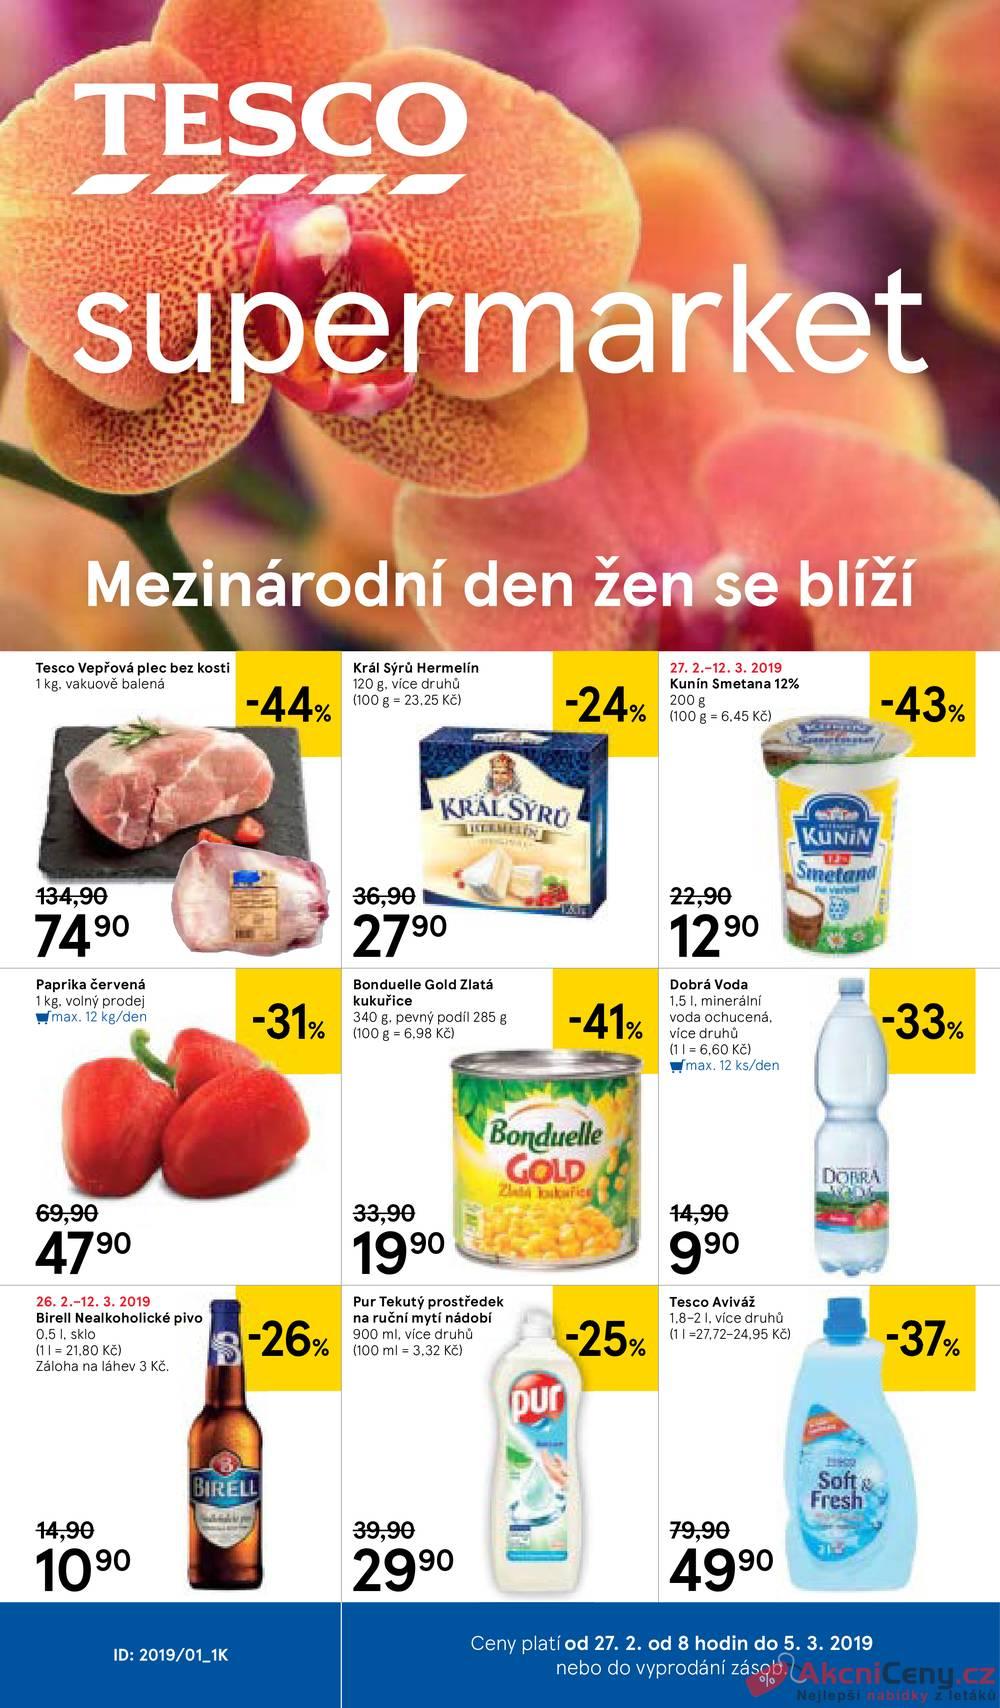 da54adbb55 Slevový leták - Tesco supermarkety 27.2. - 5.3. - eMimino.cz